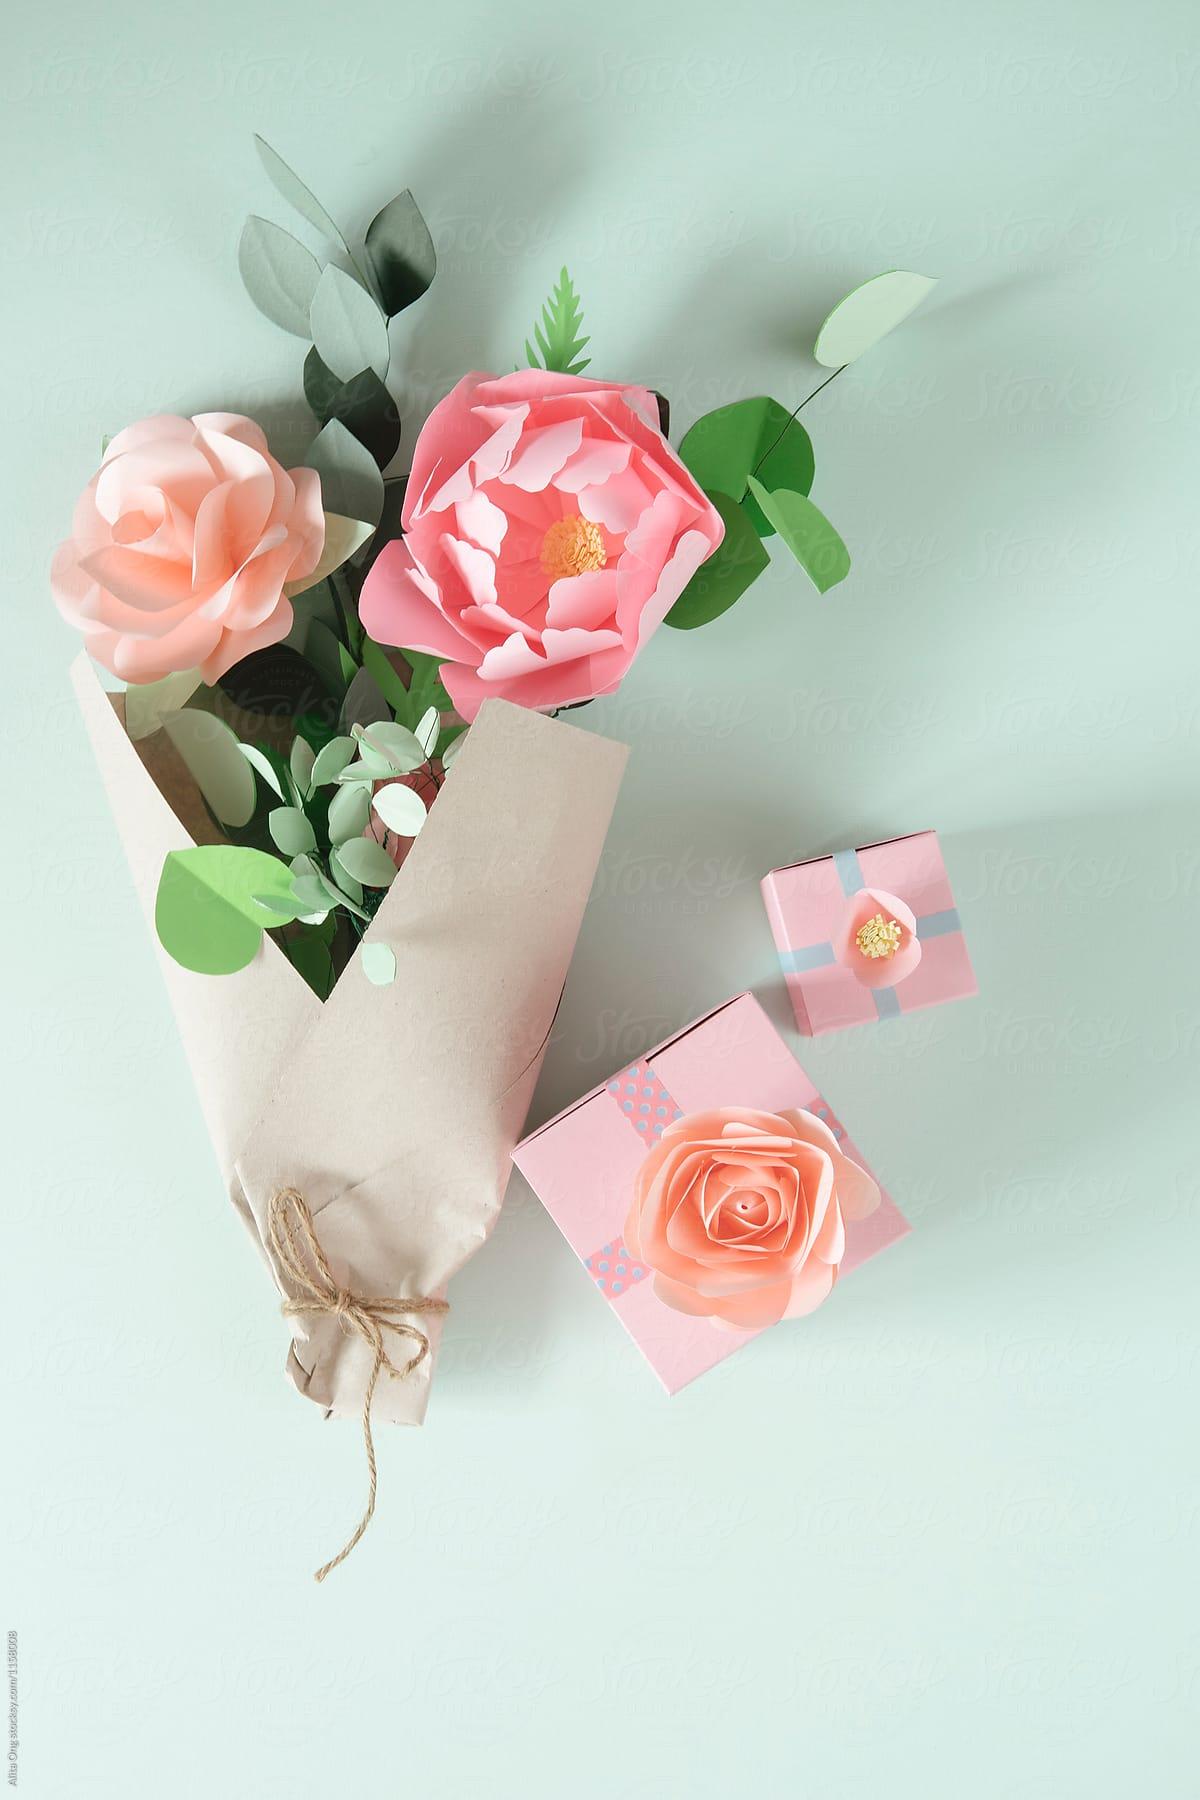 Paper Flowers Bouquet Stocksy United